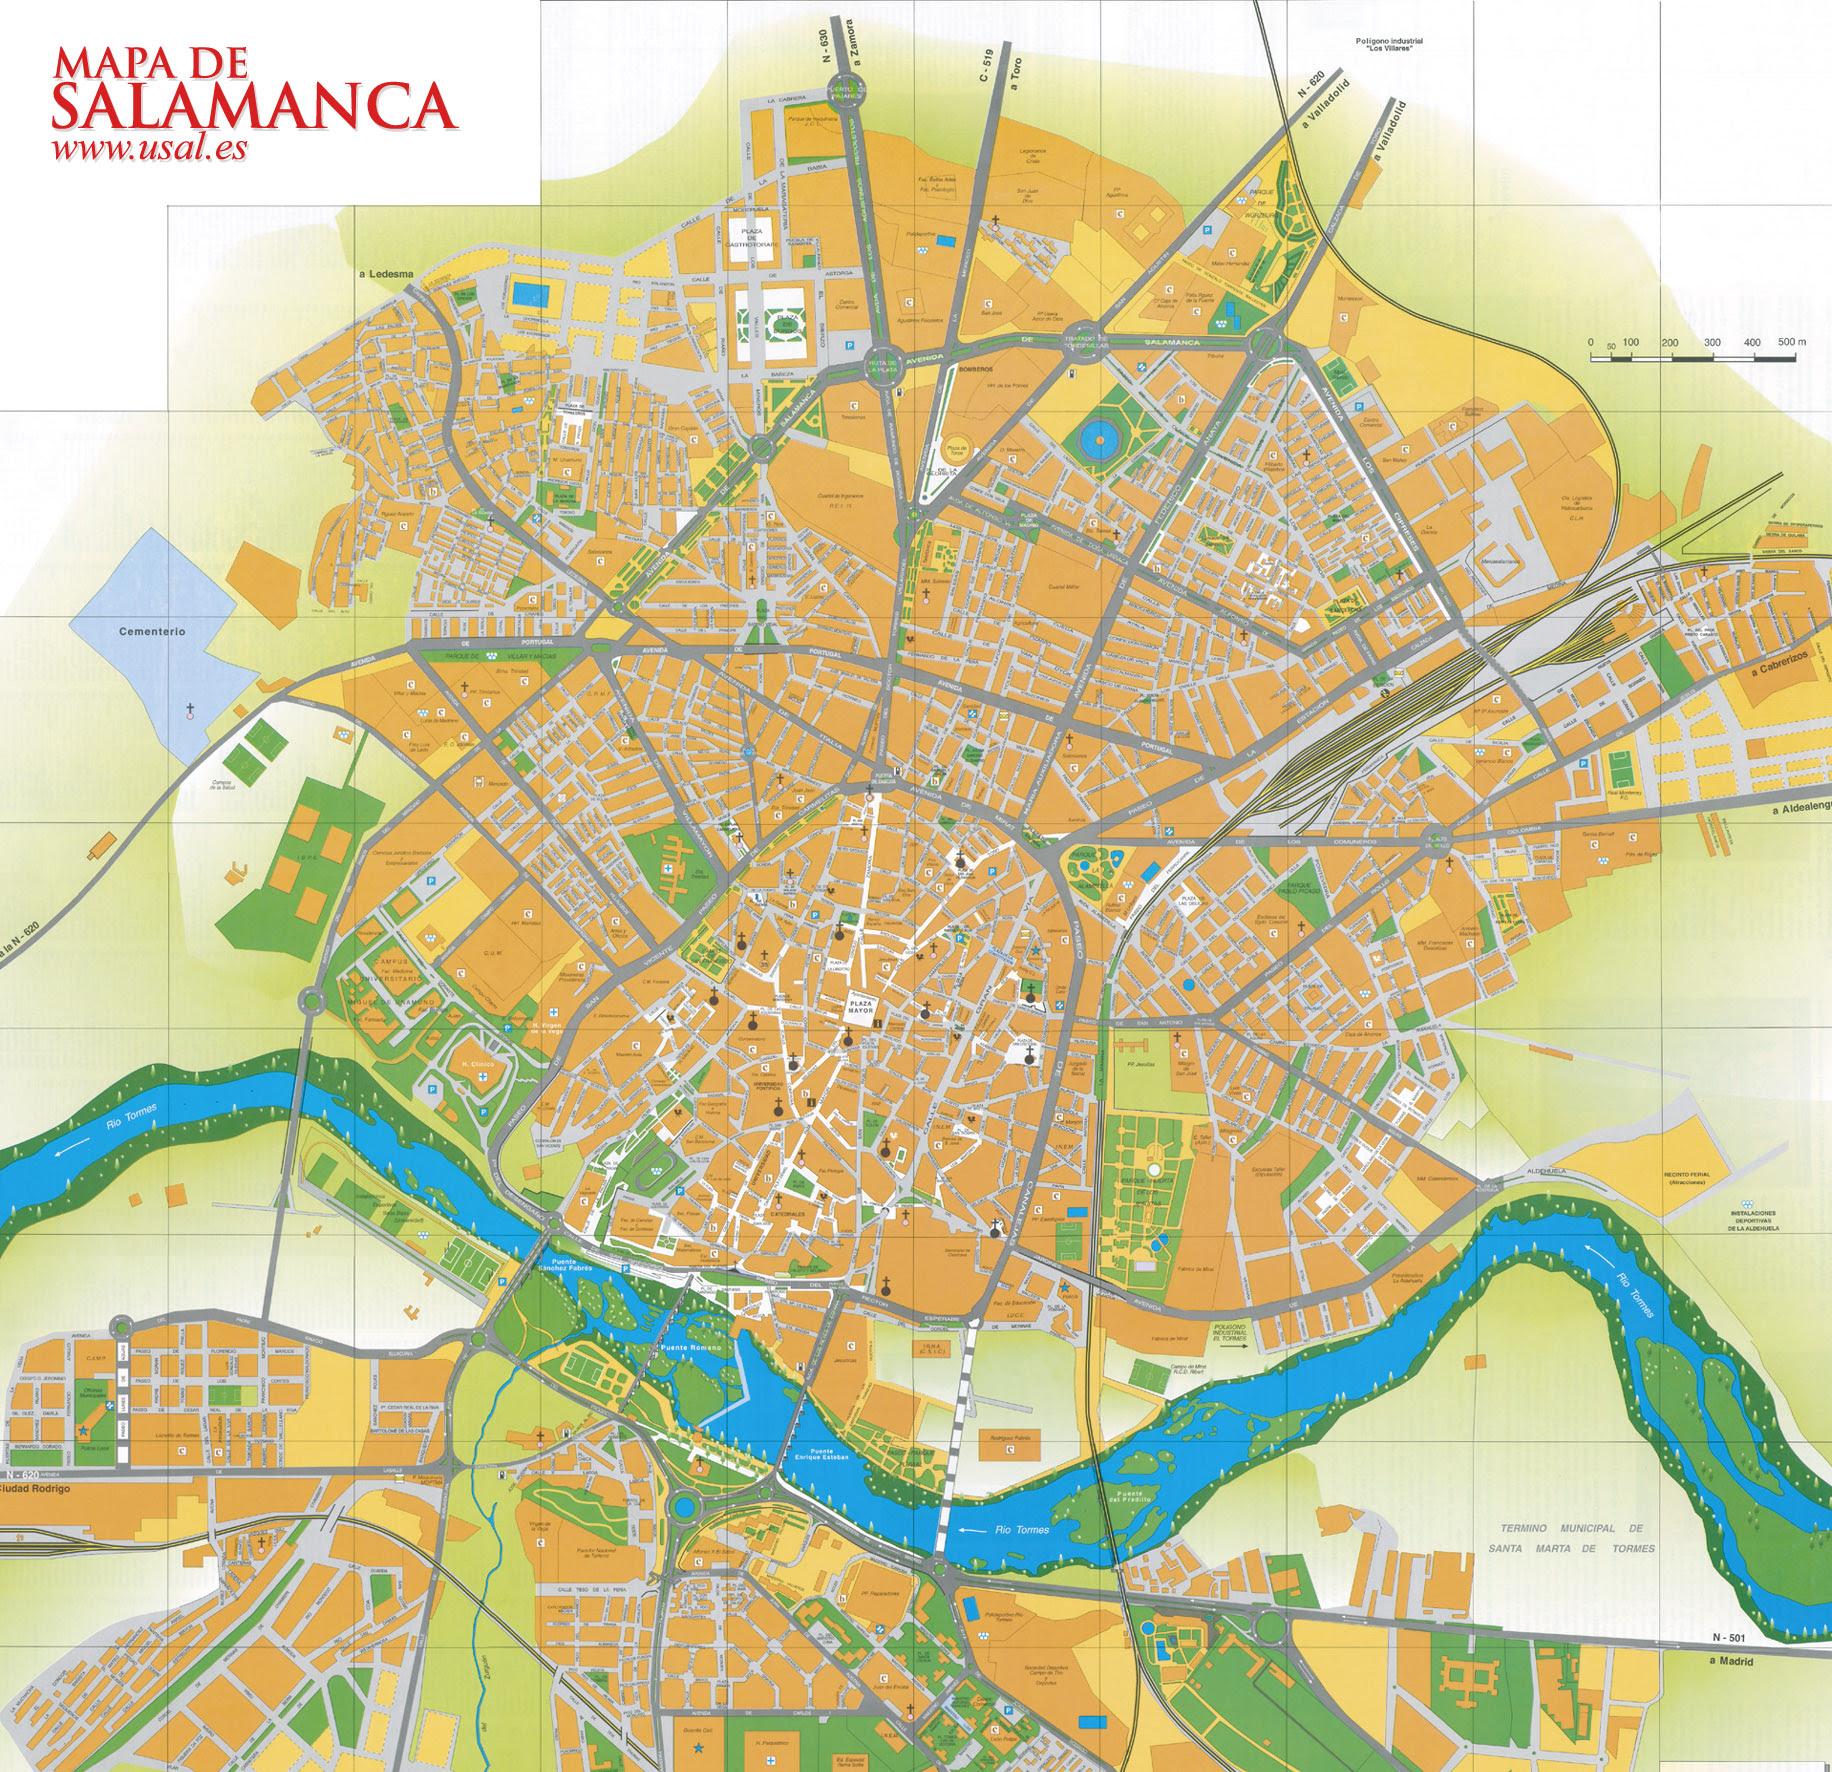 Mapa de Salamanca